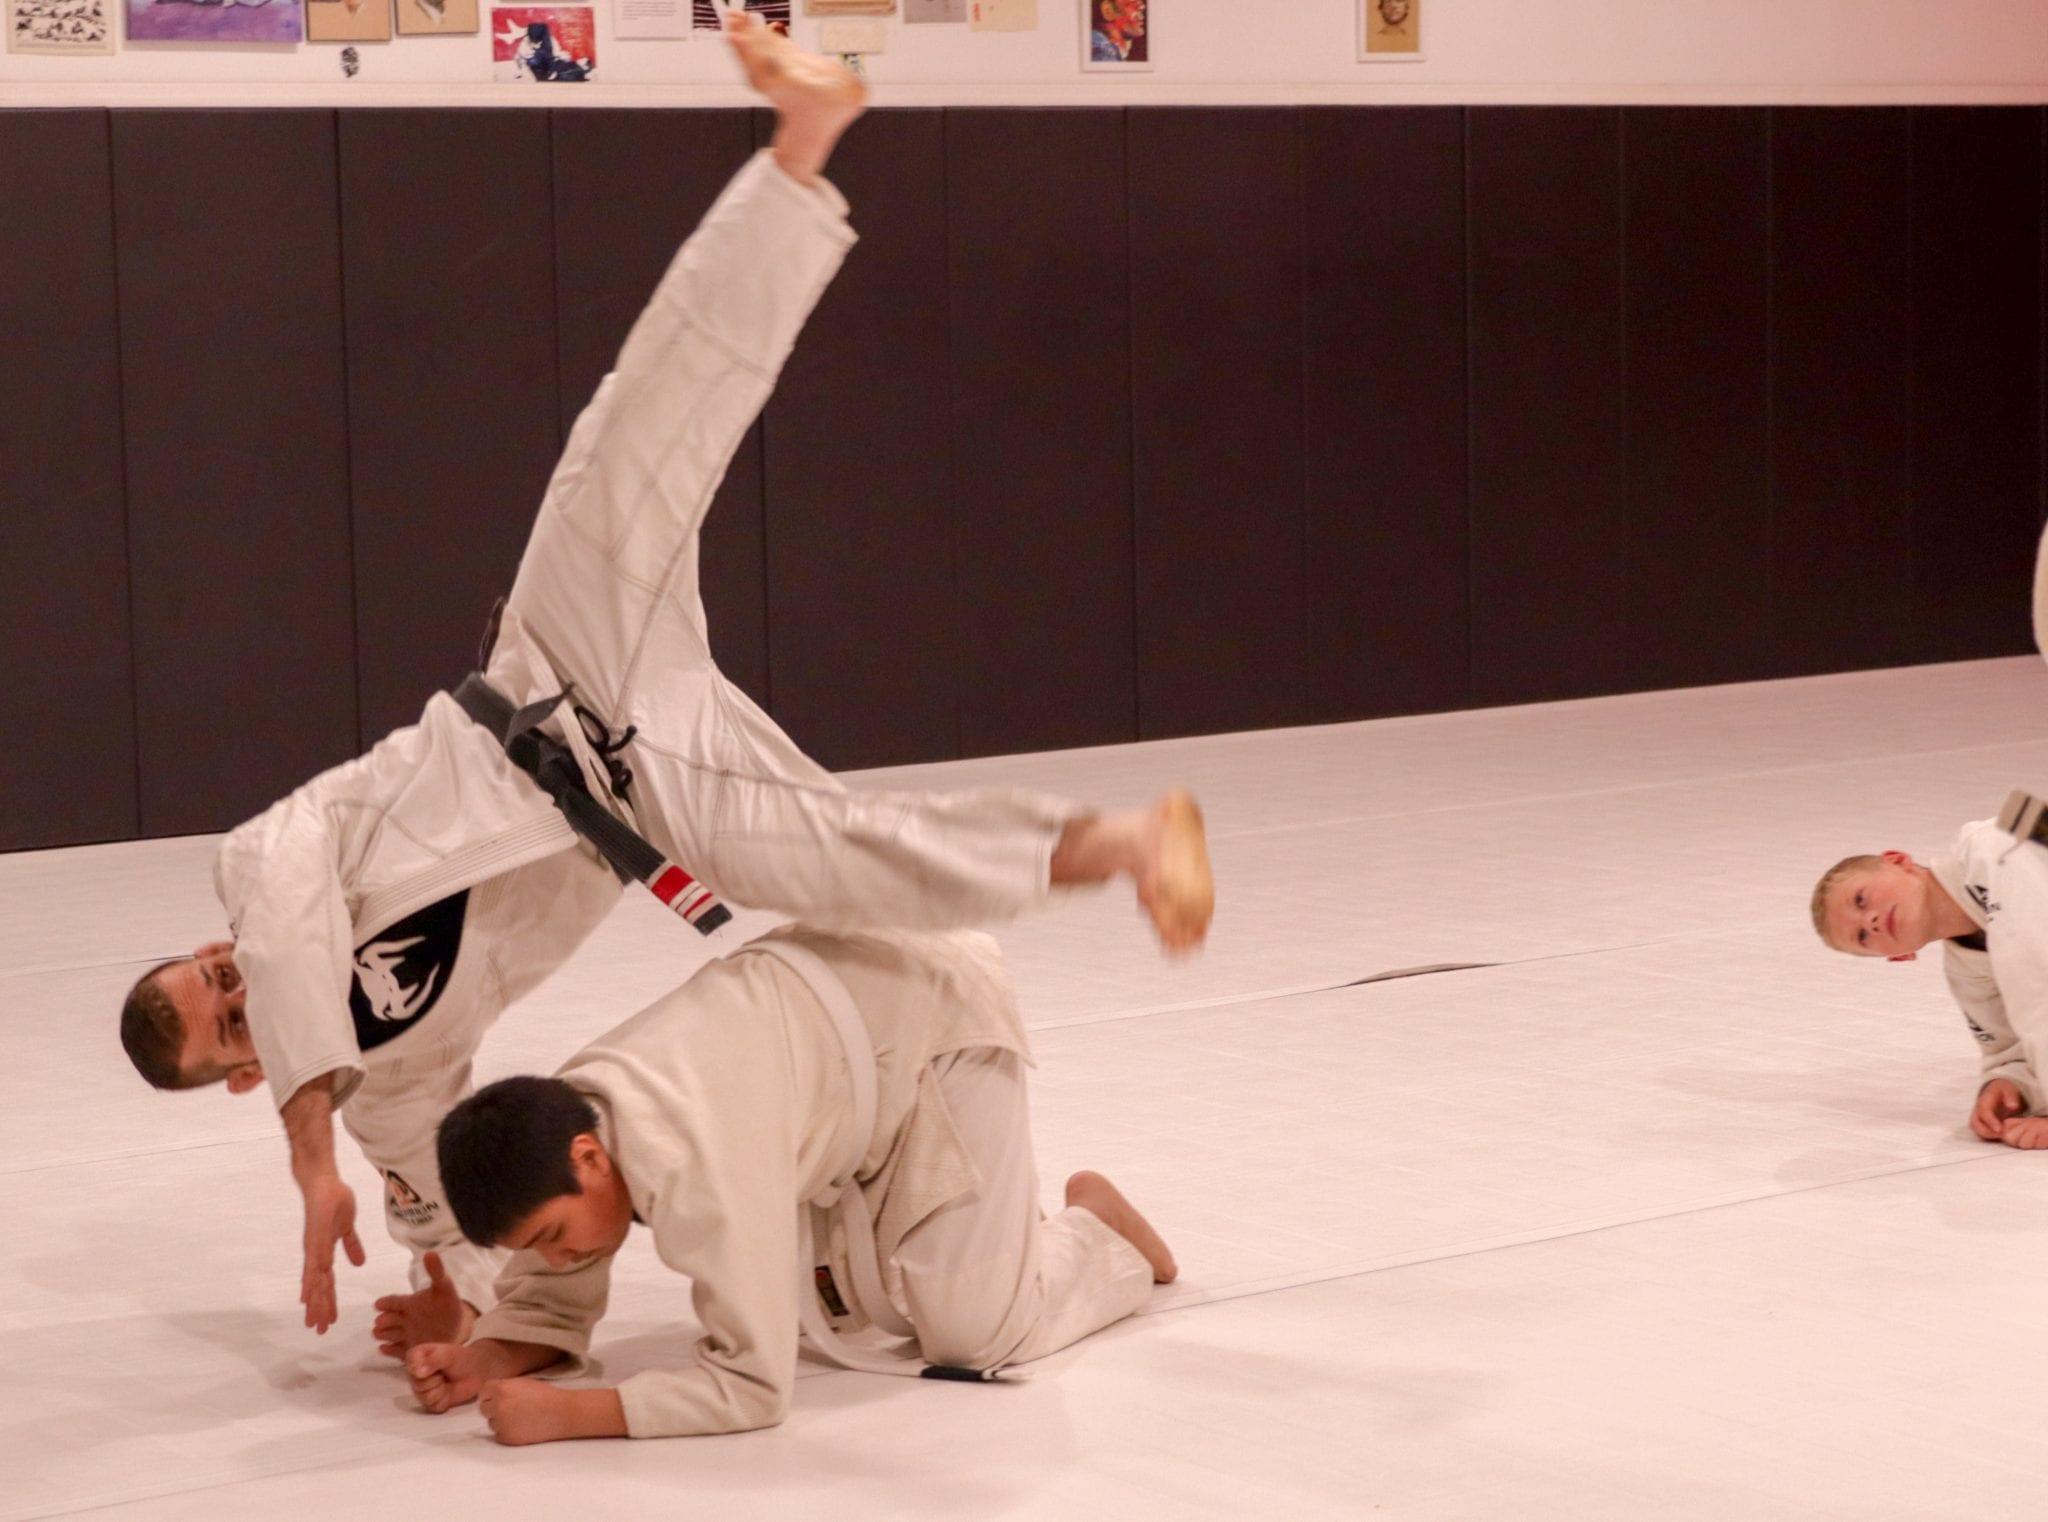 brian practicing a bjj move